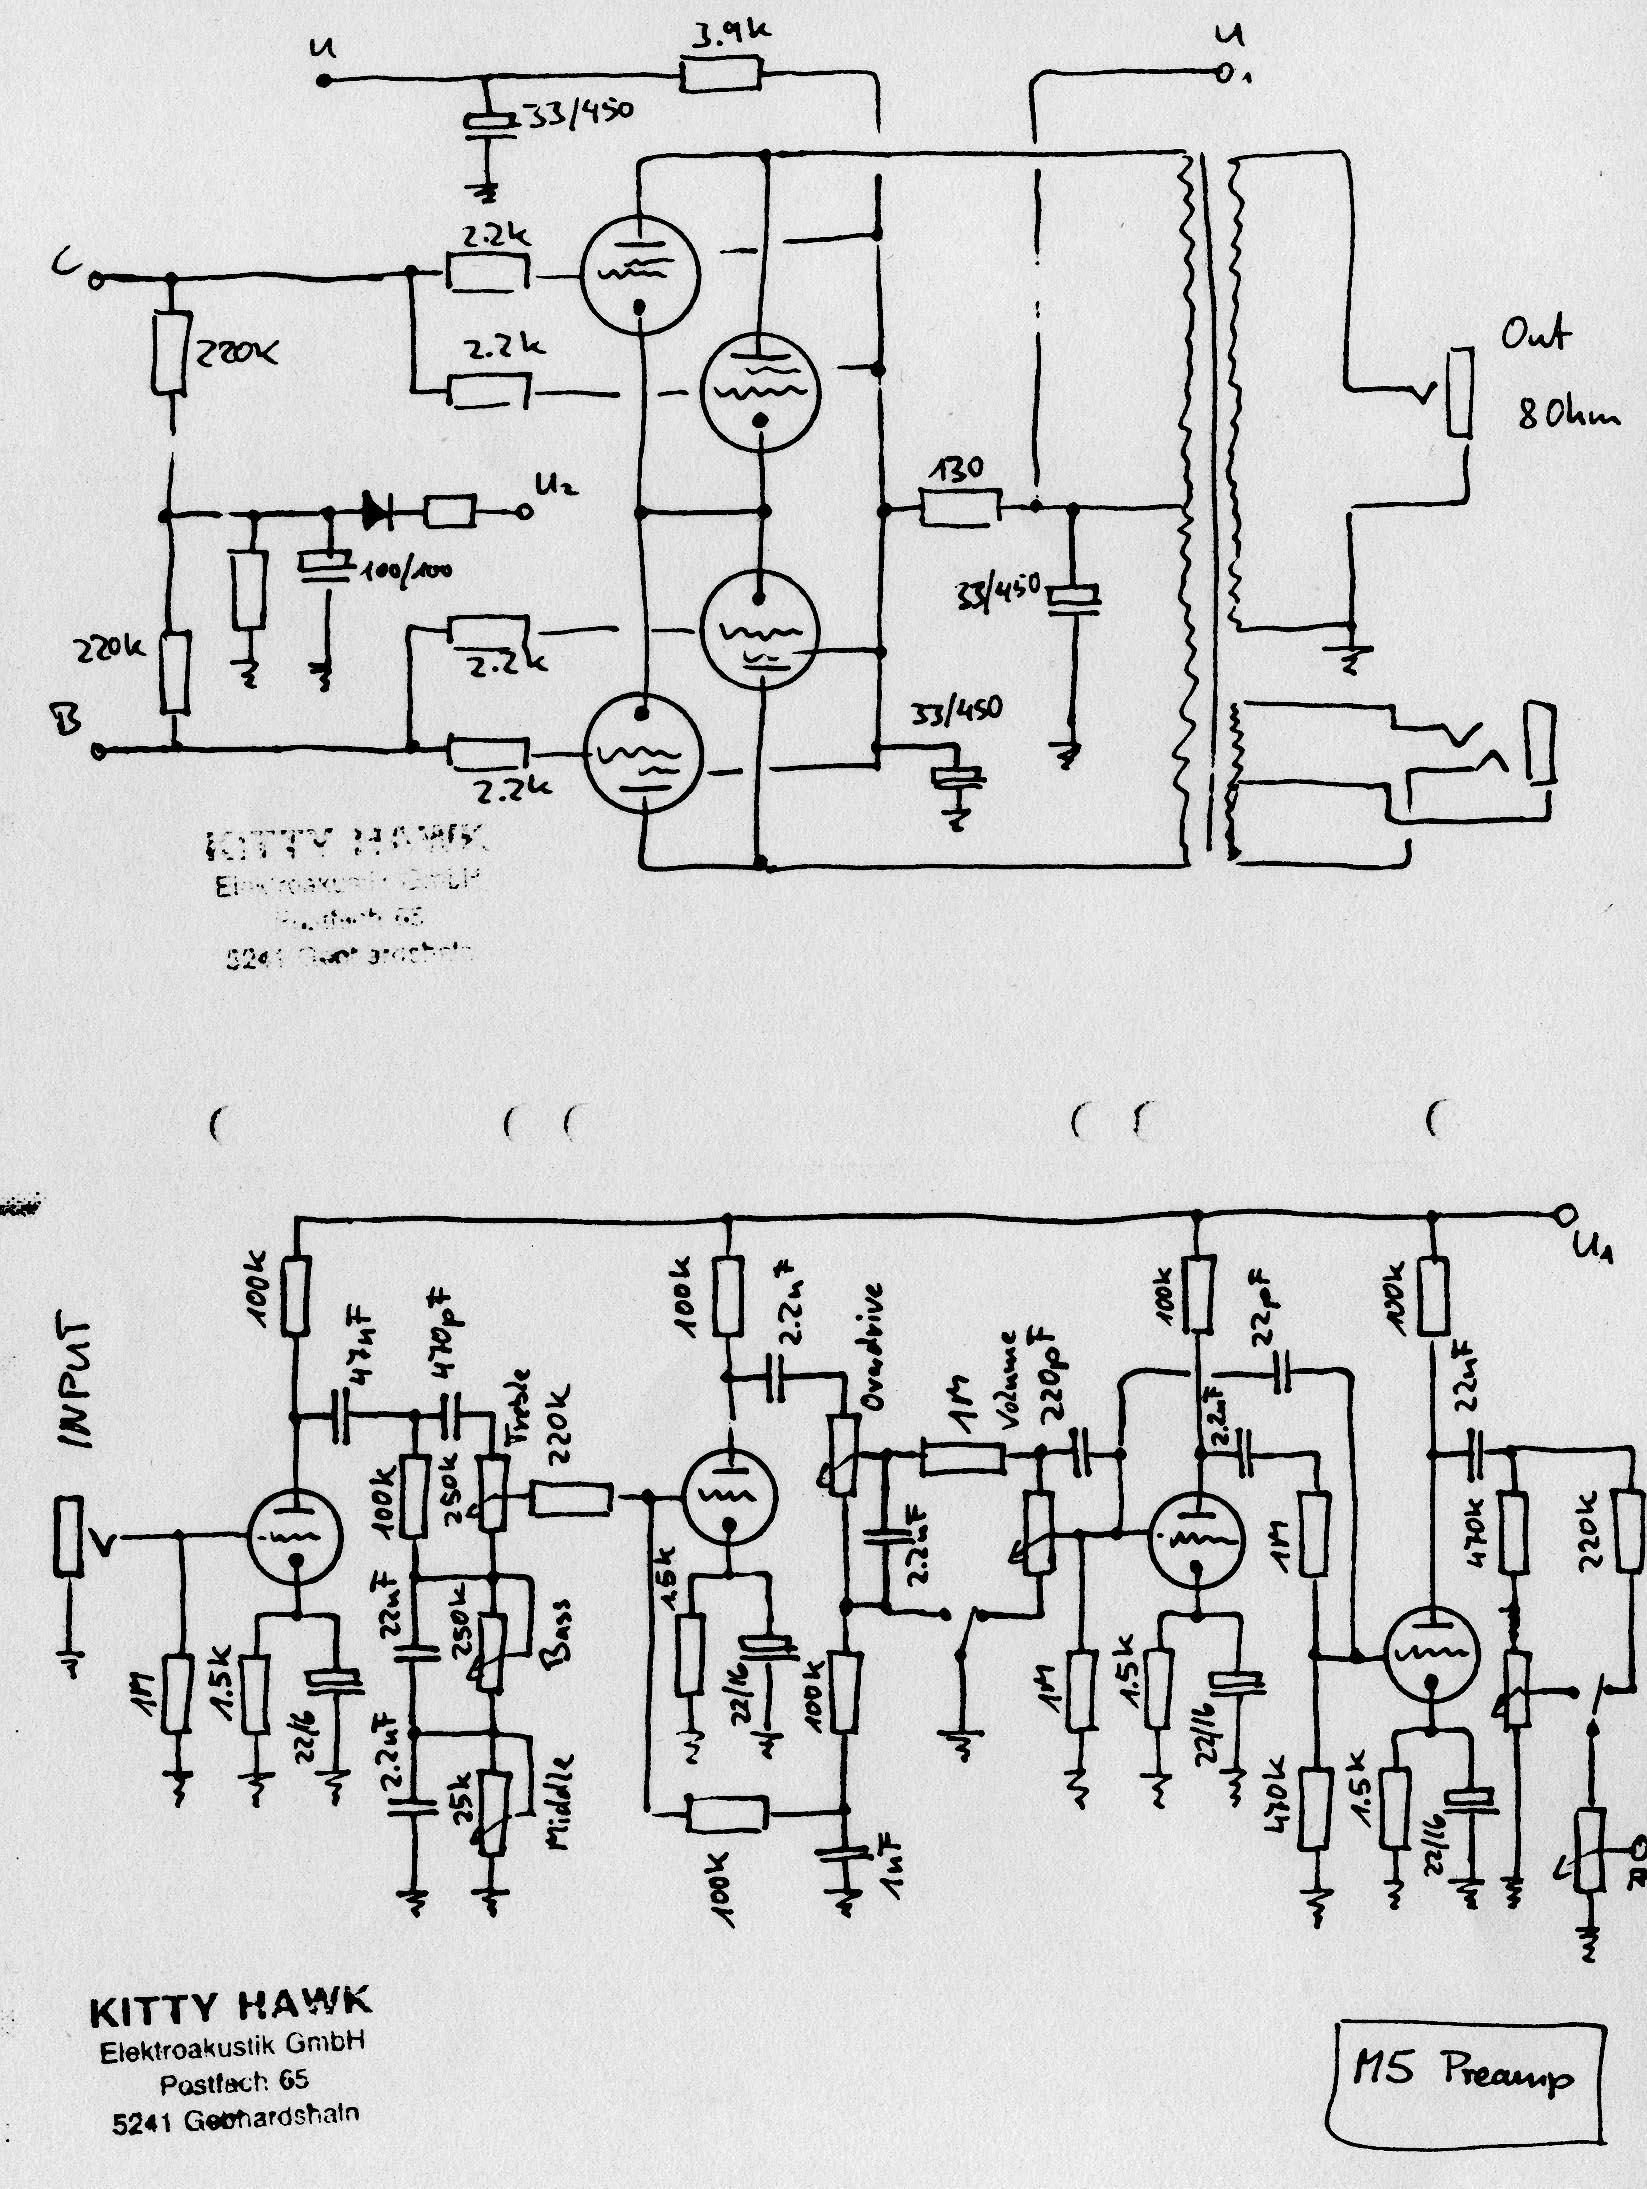 Help In Need Of Schematic For Kitty Hawk M5 45 Watt Combo